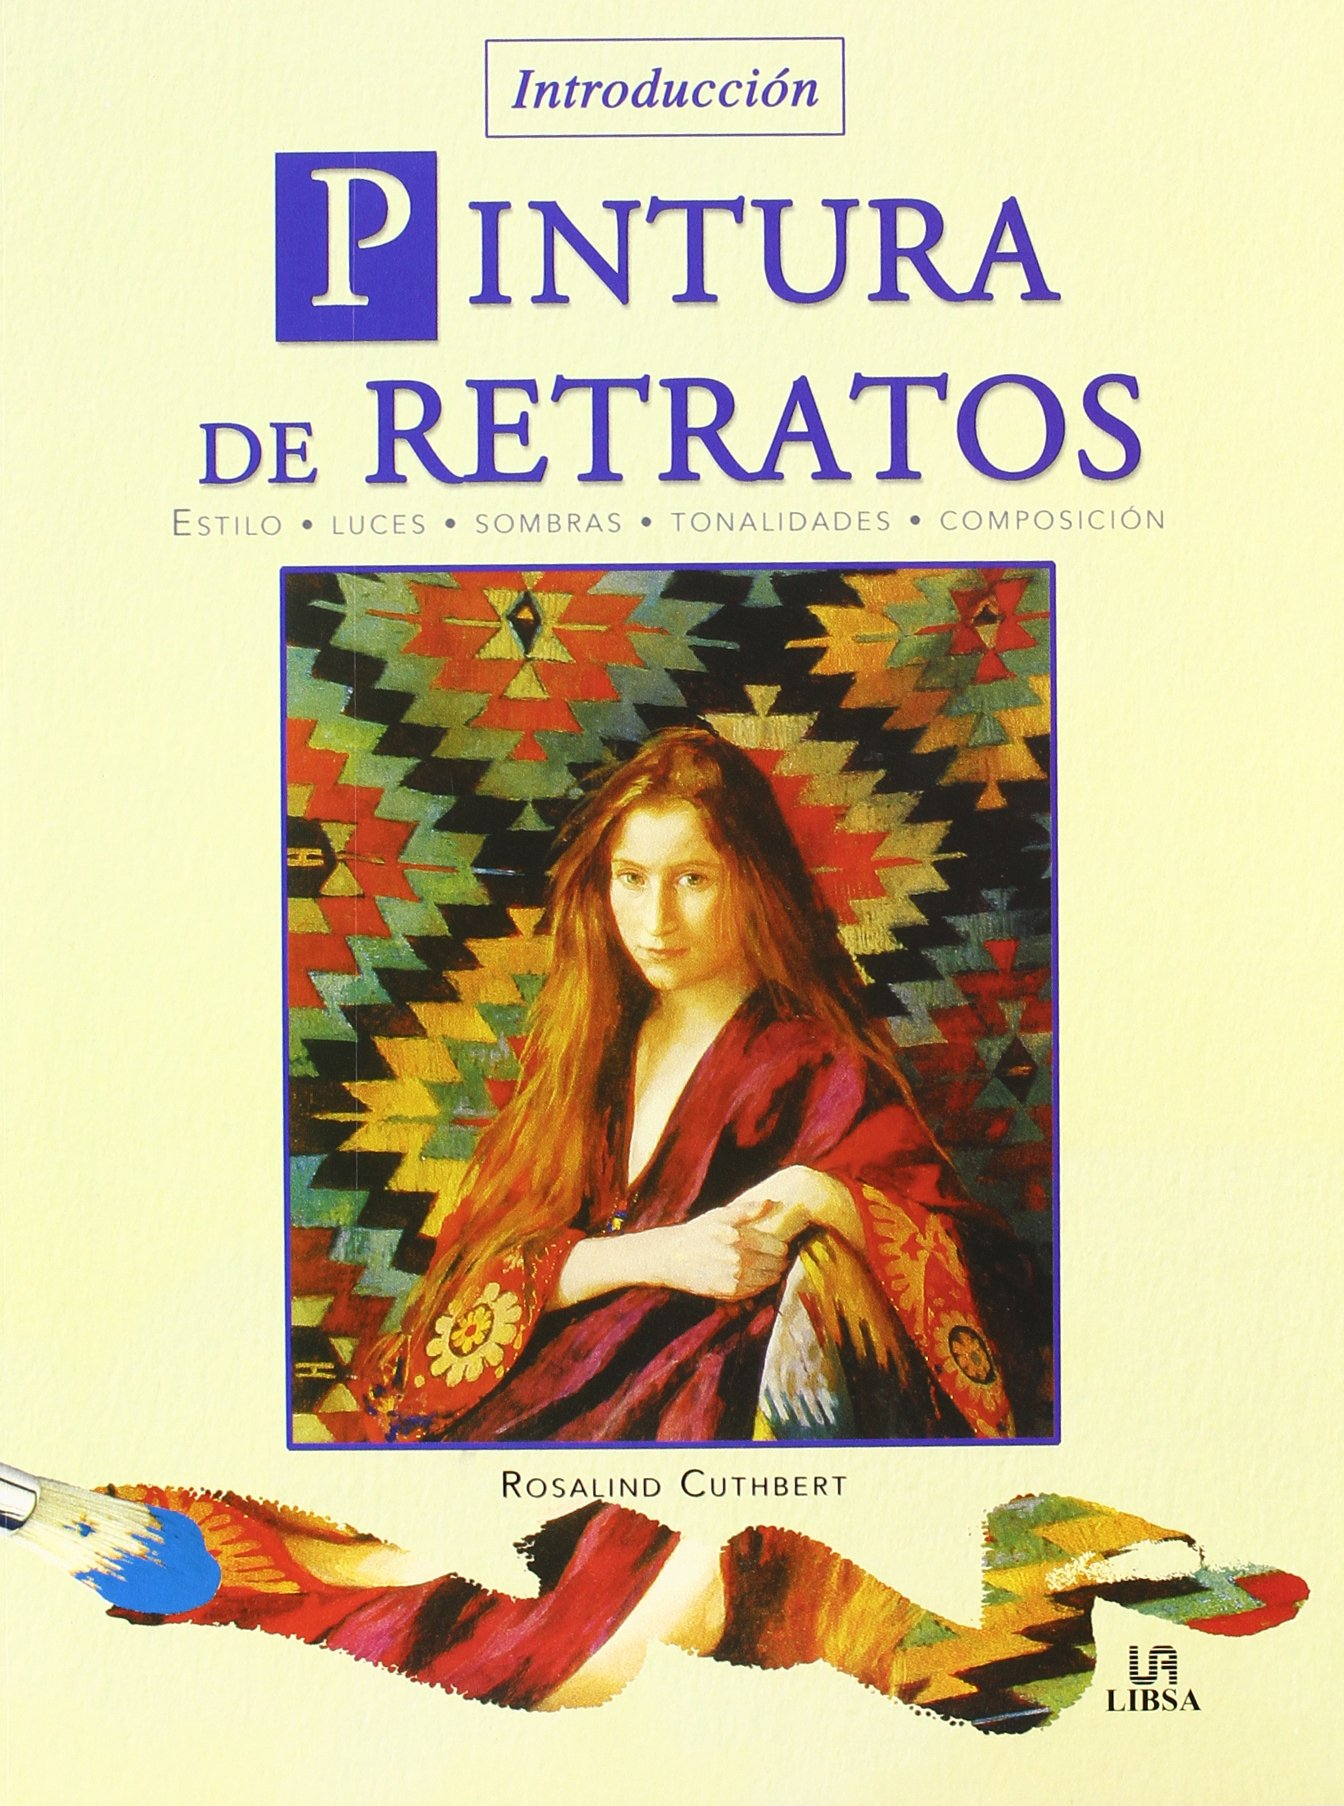 Pintura de Retratos/ An Introduction to Painting Portraits: Estilo Luces Sombras Tonalidades Composicion / Styles Lights Shadows Tonalities Composition (Introduccion / Introduction) (Spanish Edition)